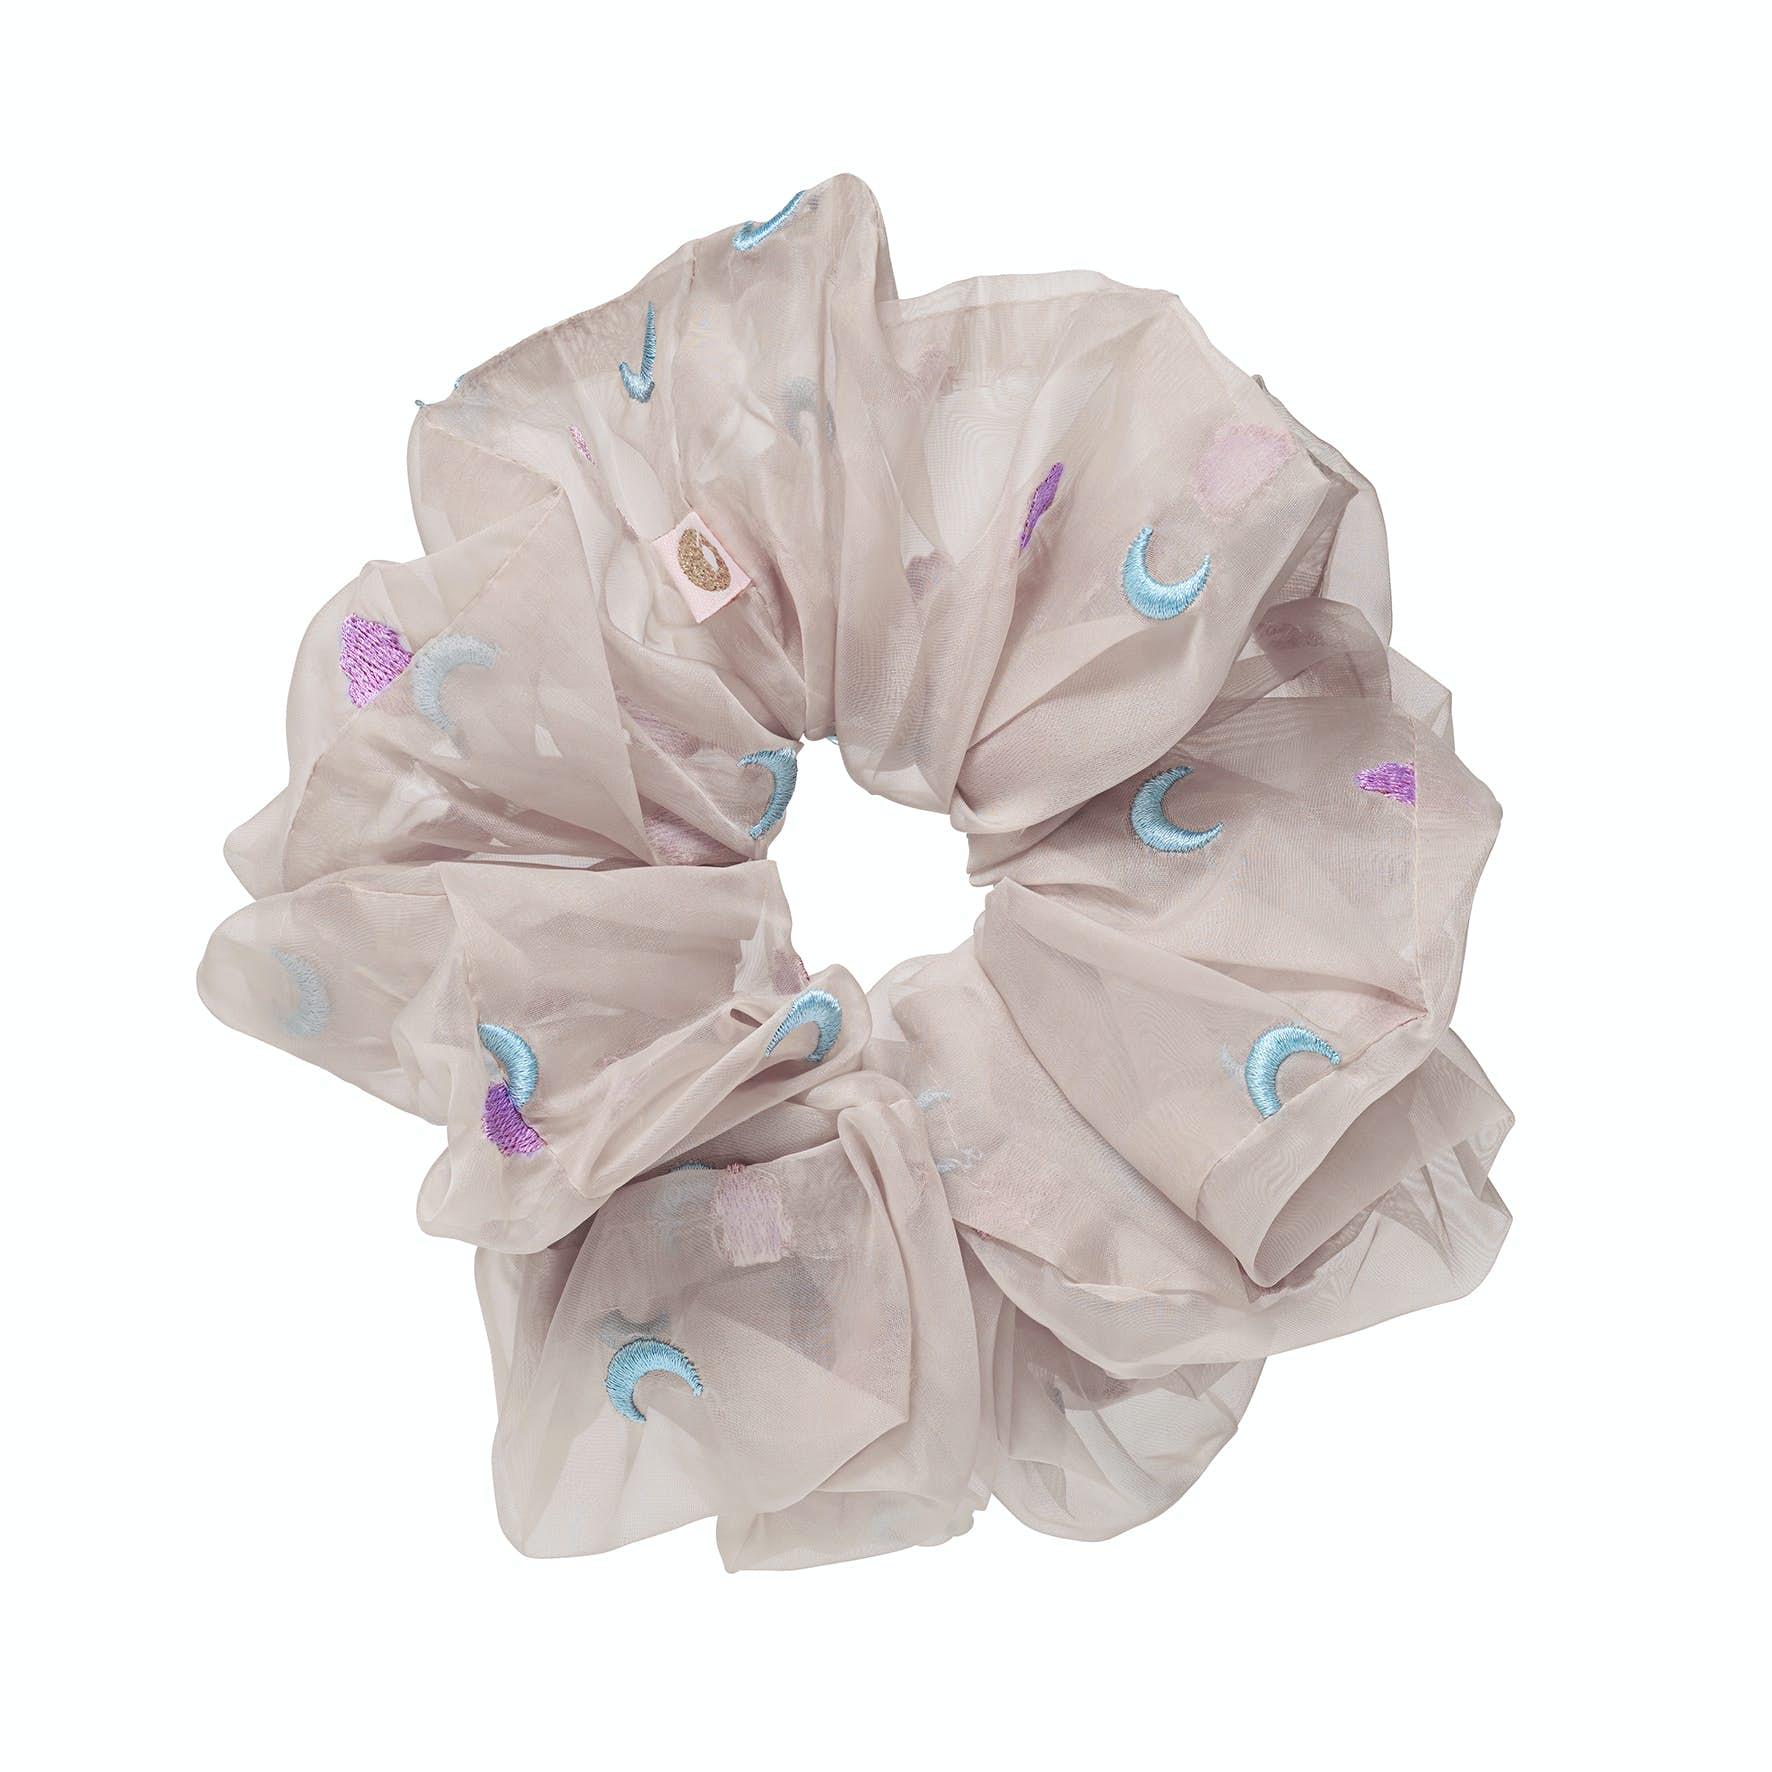 Reese Cloud Sand Scrunchie fra Maanesten i Polyester